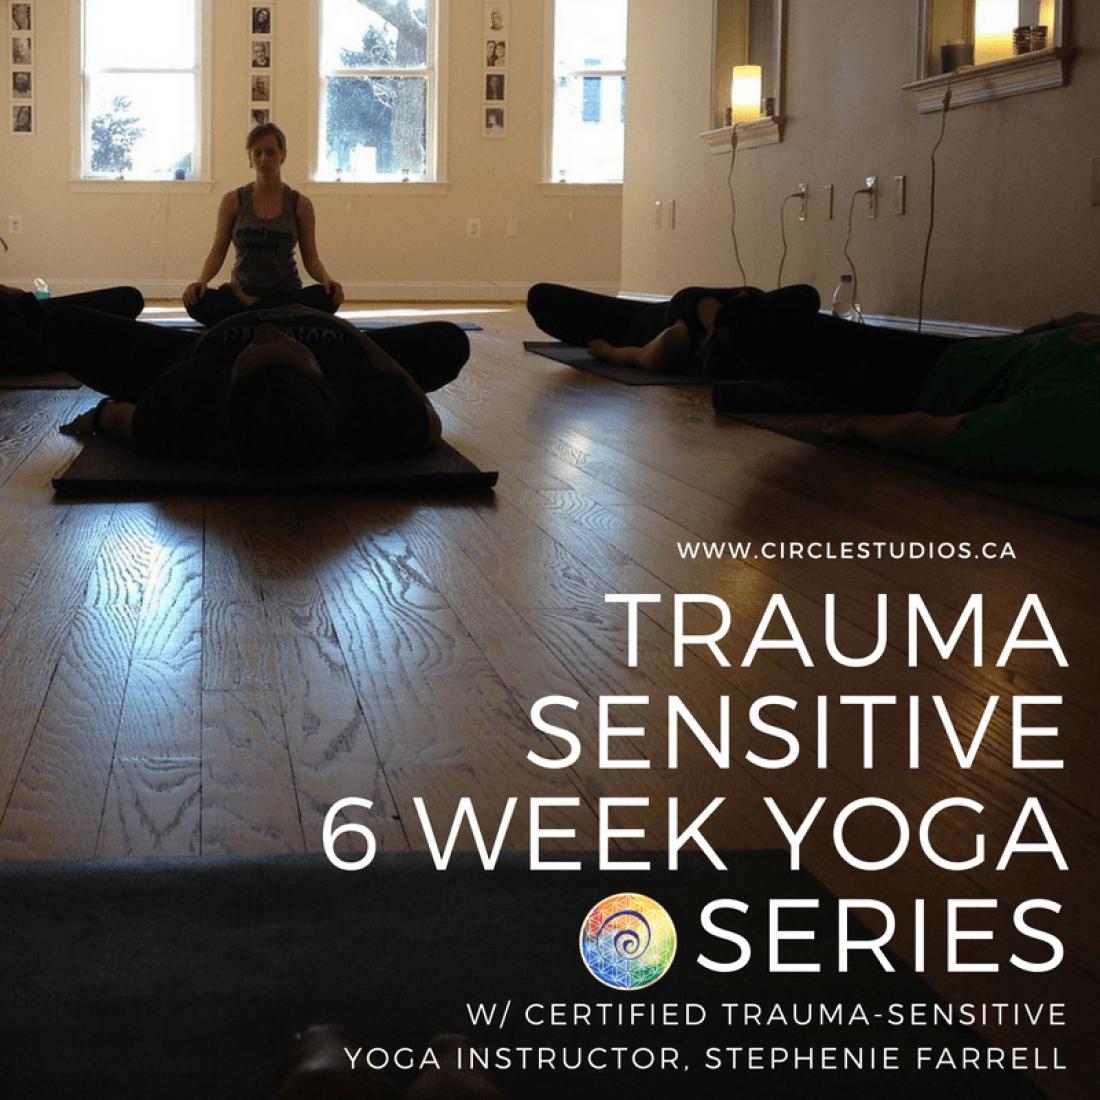 Trauma Sensitive 6 Week Yoga Series